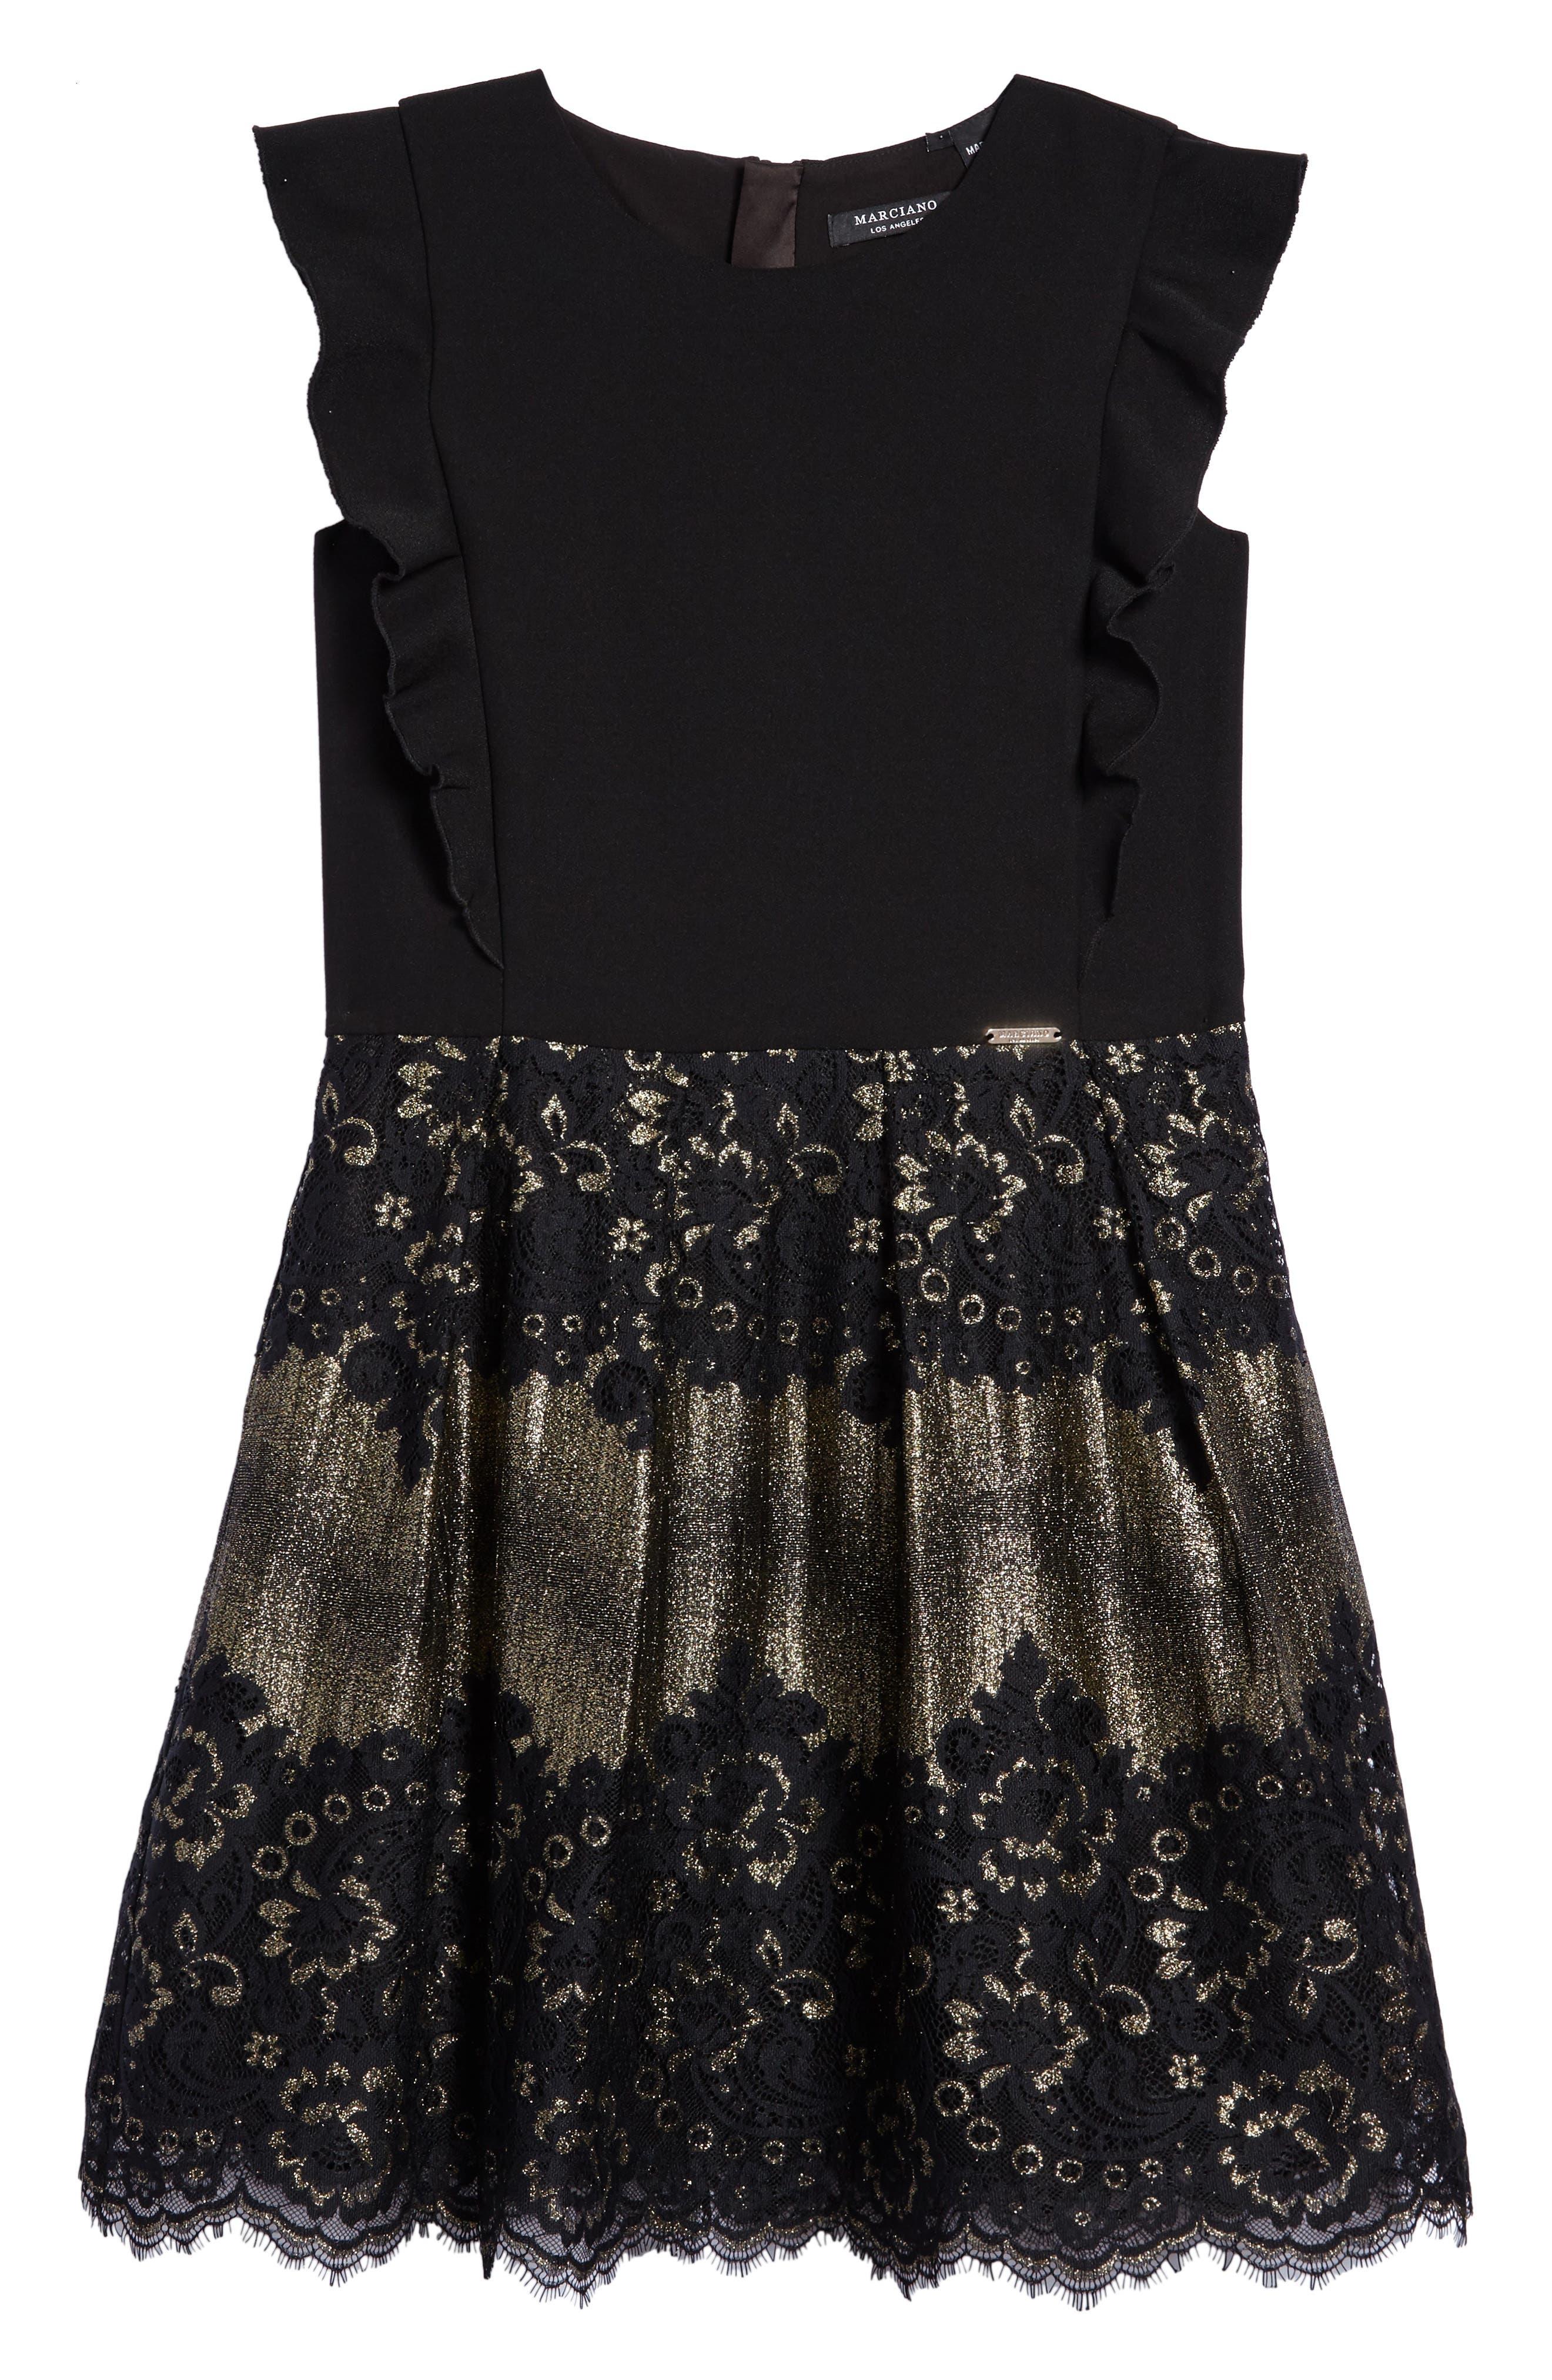 Marciano Metallic Lace Dress (Big Girls)